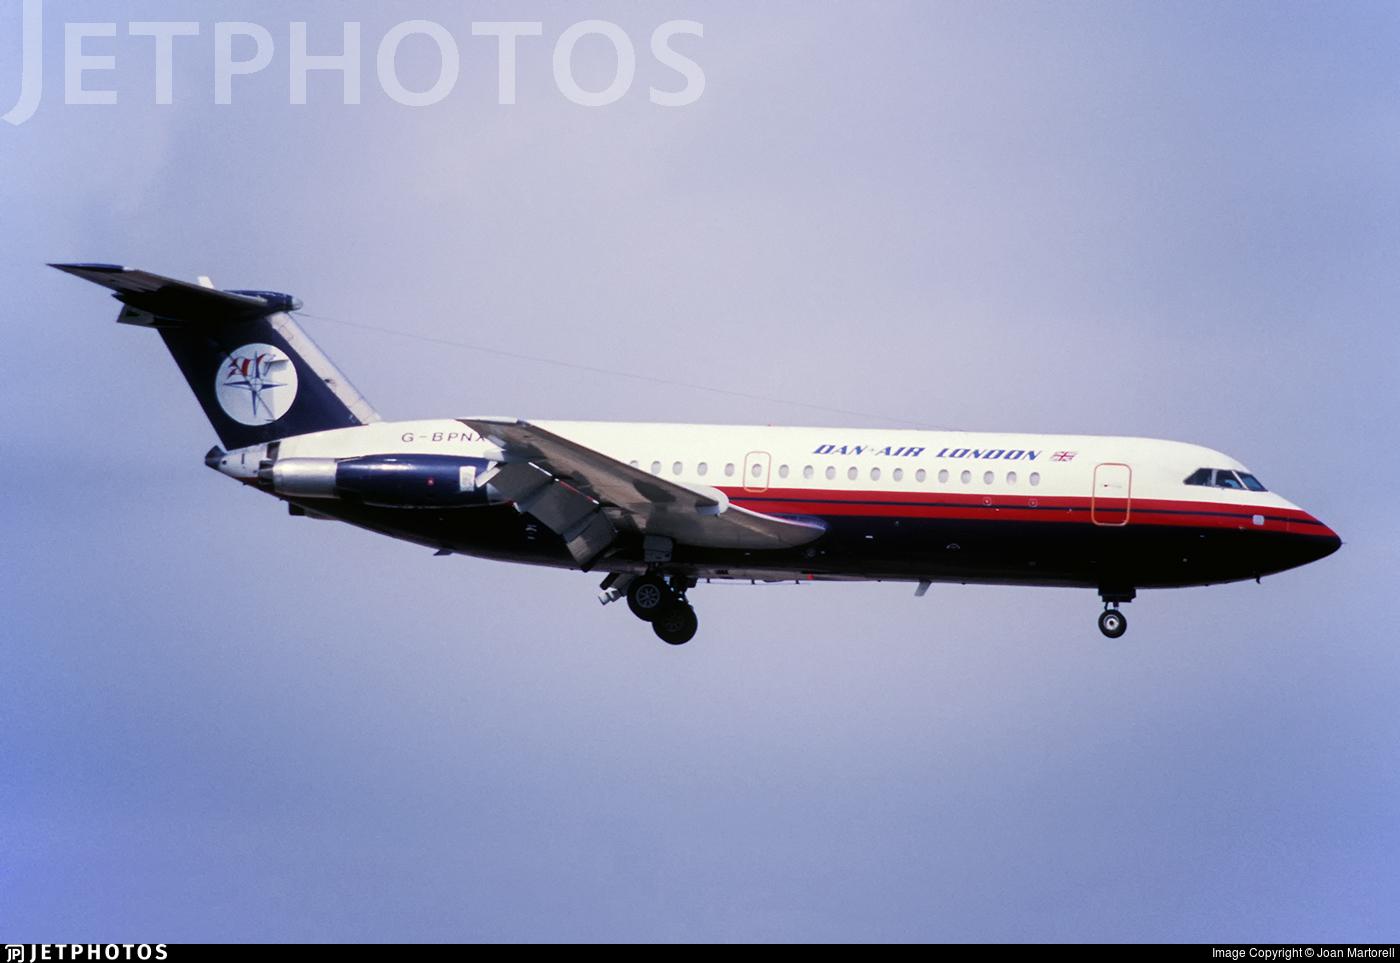 G-BPNX - British Aircraft Corporation BAC 1-11 Series 304AX - Dan-Air London